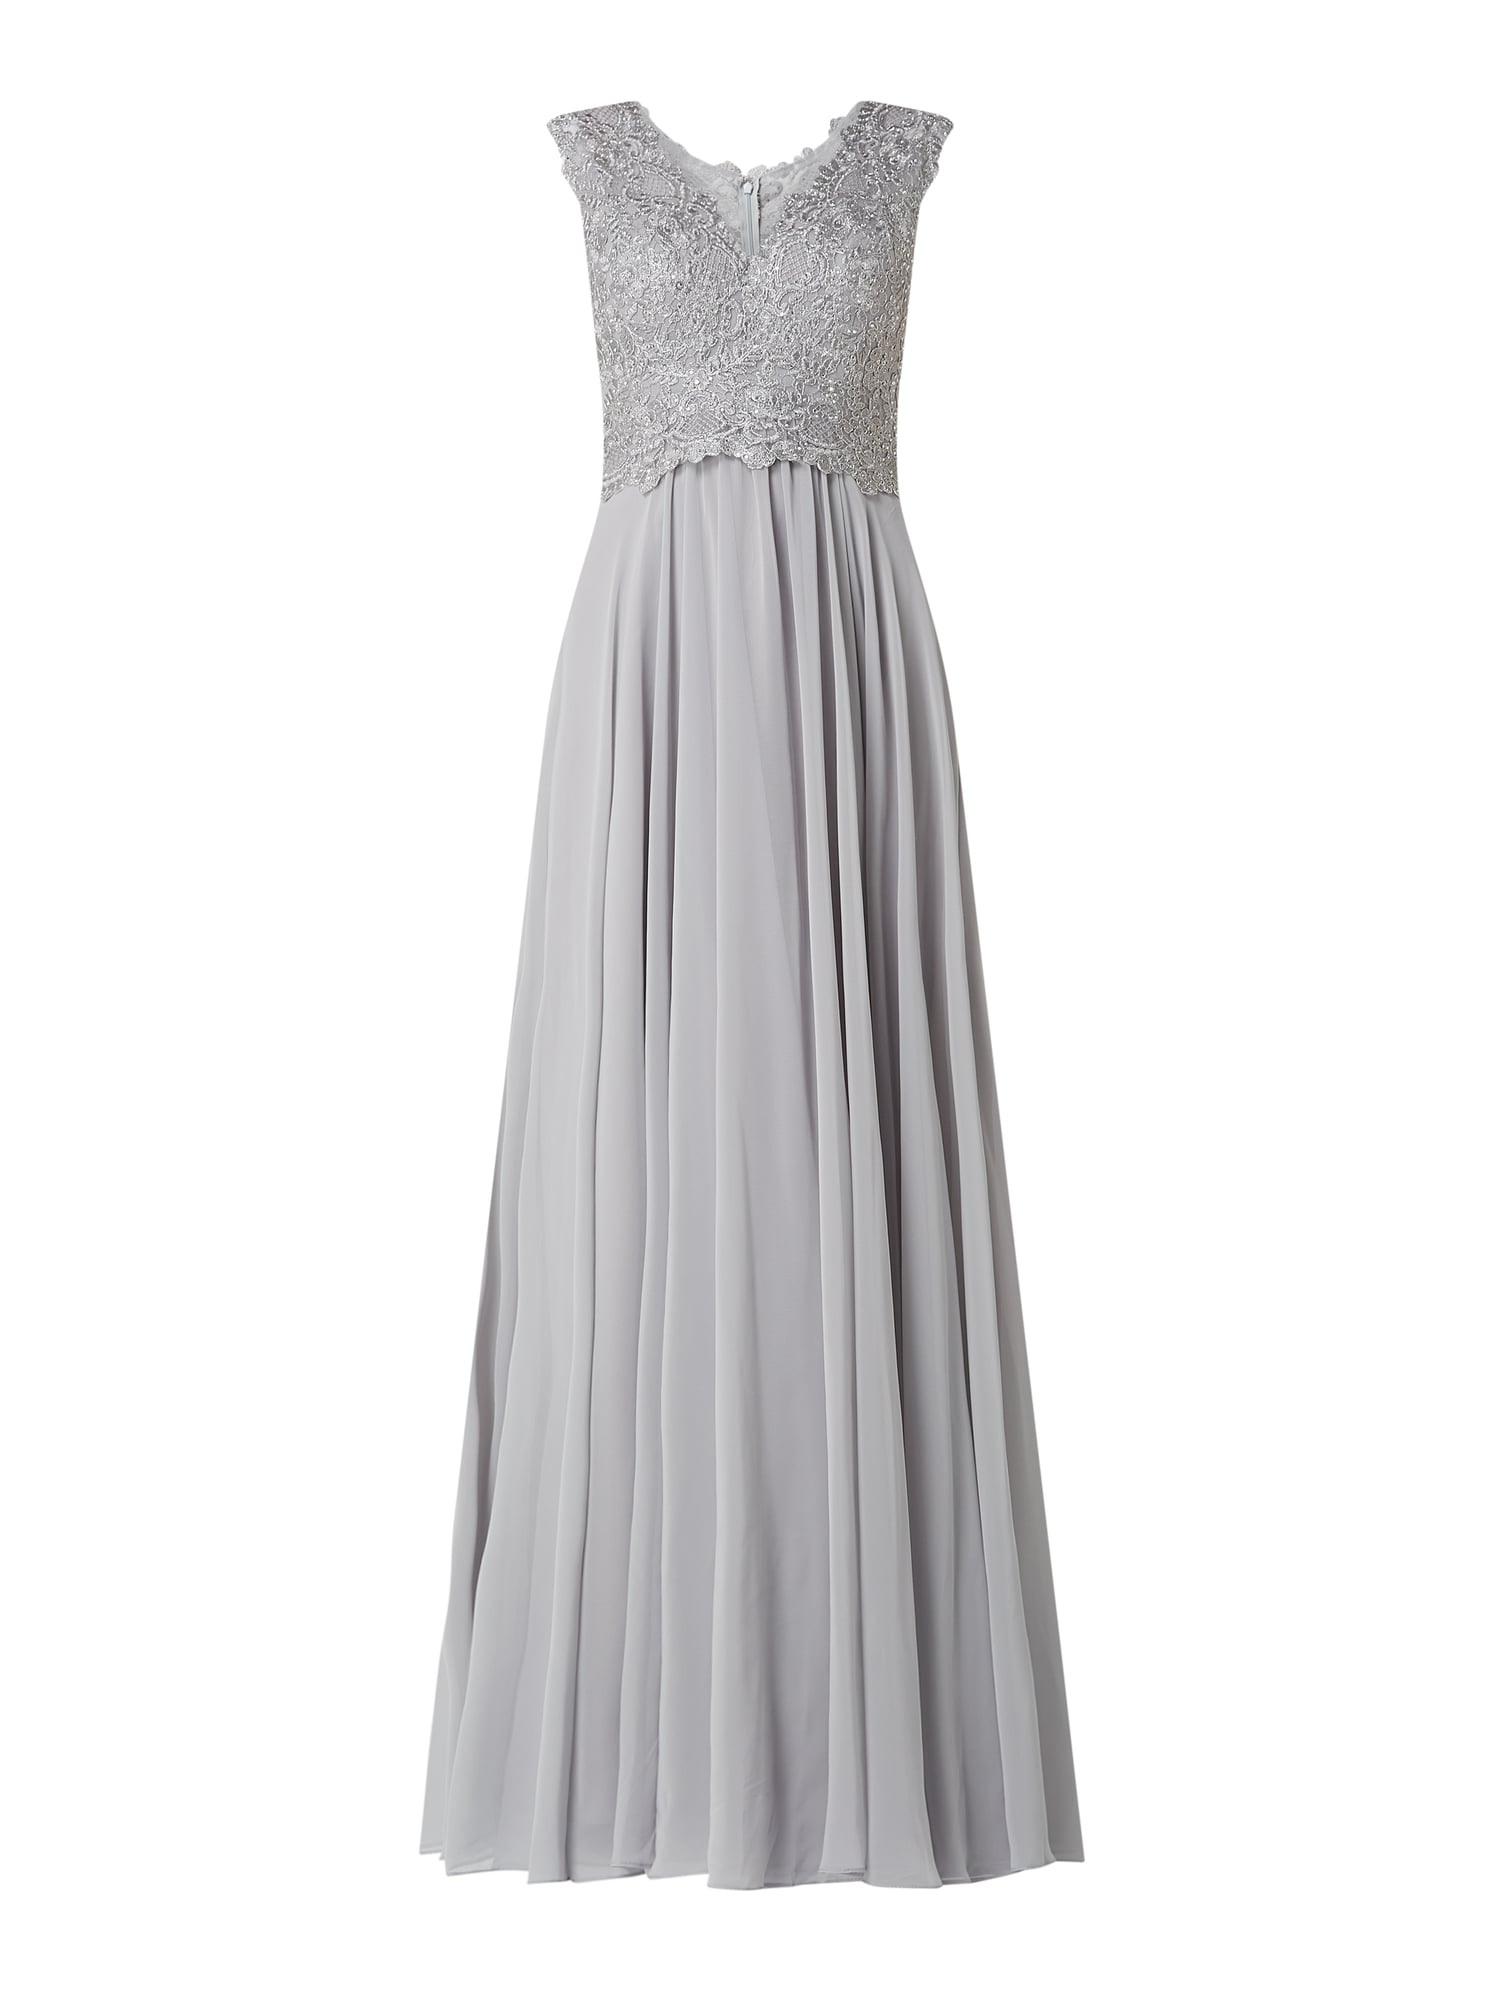 Formal Luxurius Abendkleid In Grau Boutique13 Schön Abendkleid In Grau Galerie